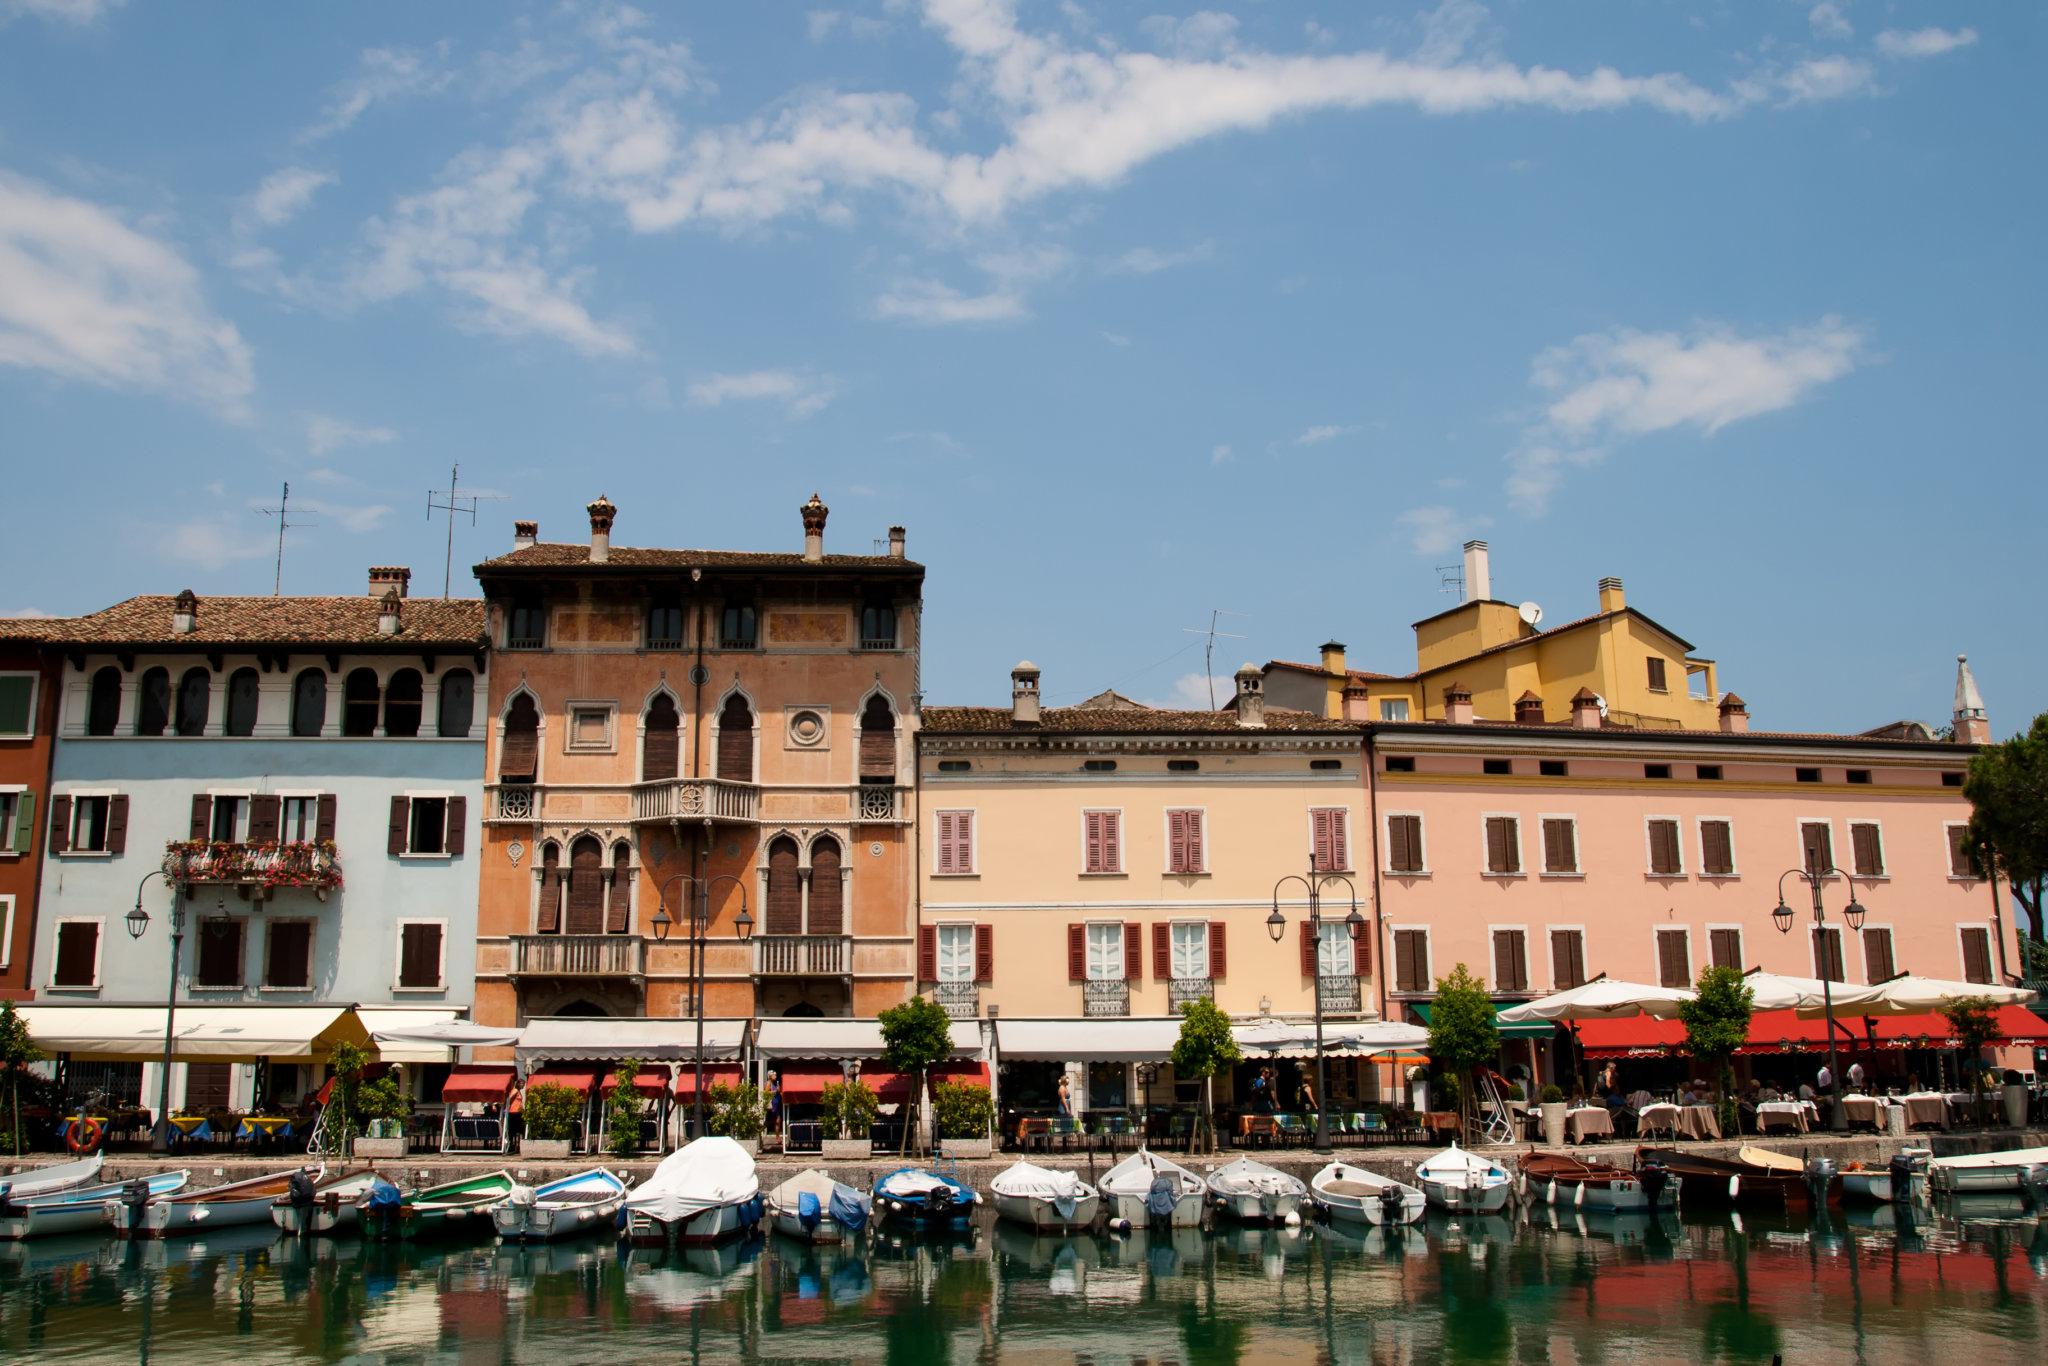 Affari in vendita in Lago di Garda